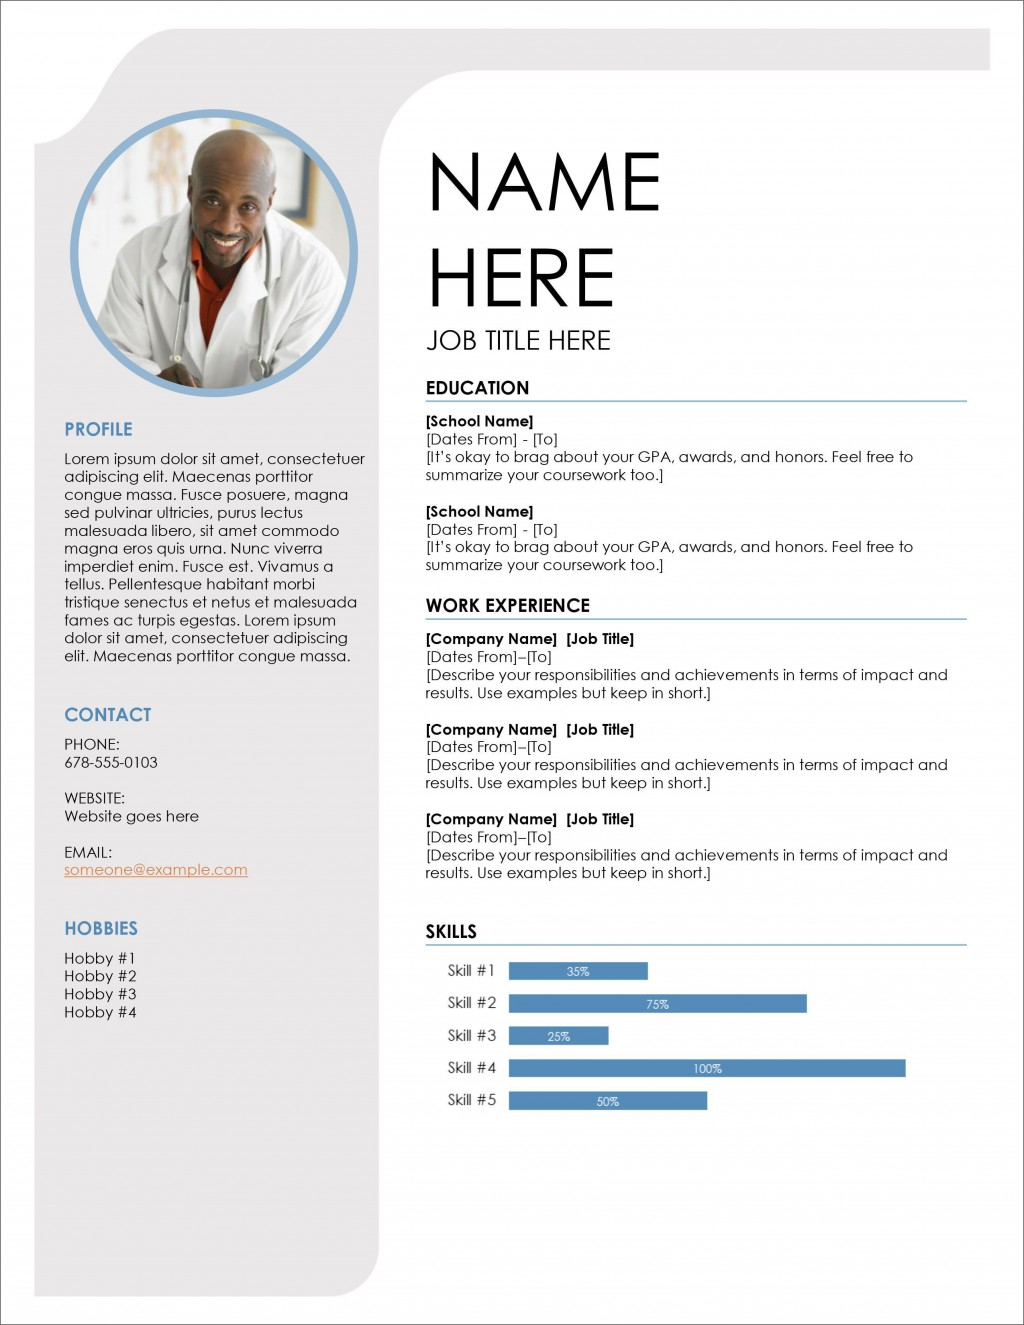 006 Awful Download Resume Sample Free High Resolution  Teacher Cv Graphic Designer Word Format Nurse TemplateLarge